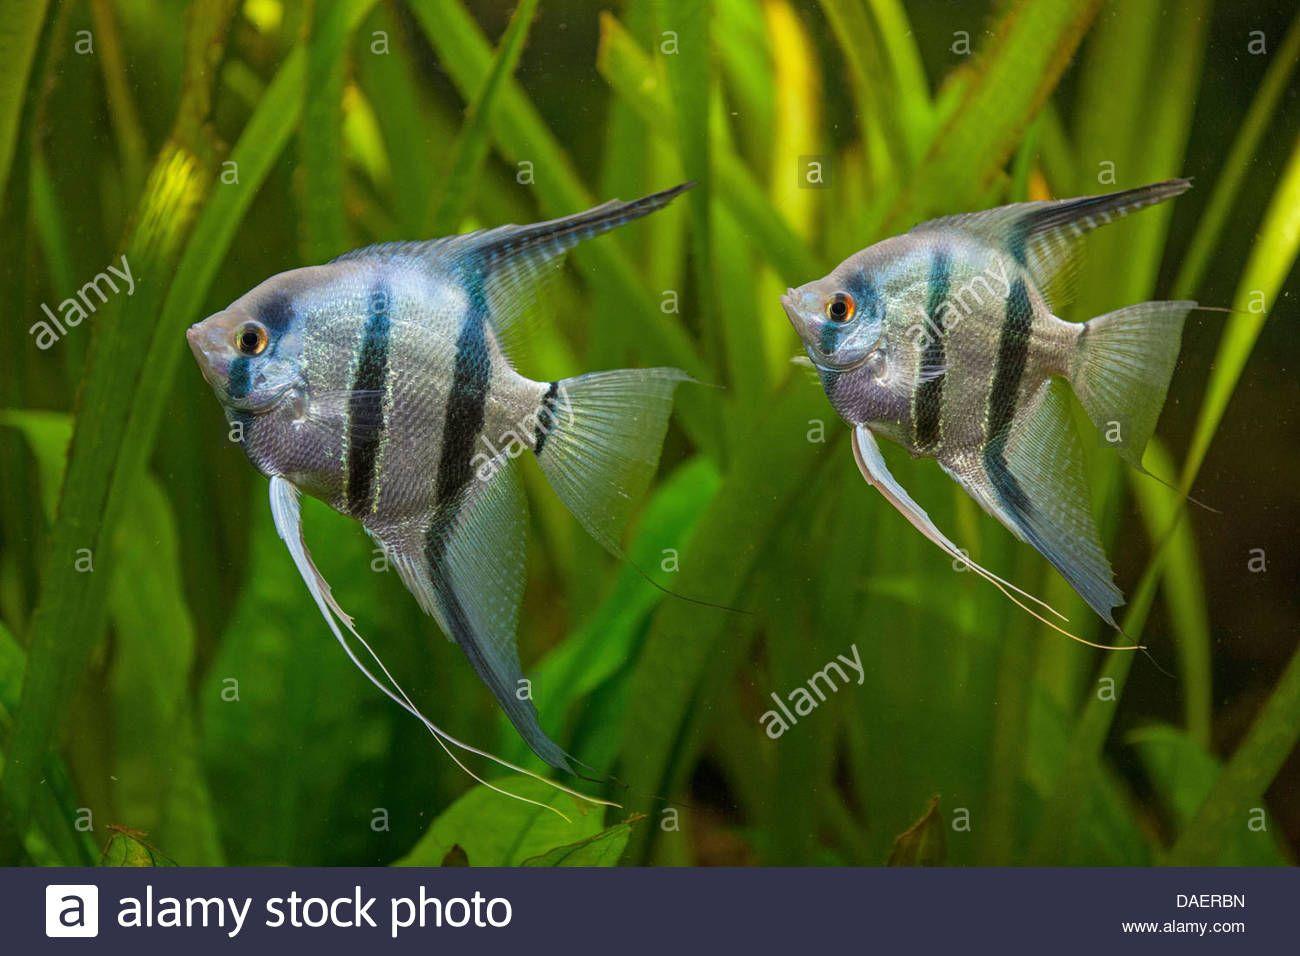 Tips 8 Angelfish Tank Mates To Accompany Your Angelfish Tag Angelfish Tank Mates Angelfish Tank Mates Aquarium Angelfis Angel Fish Fish Pet Glass Fish Tanks